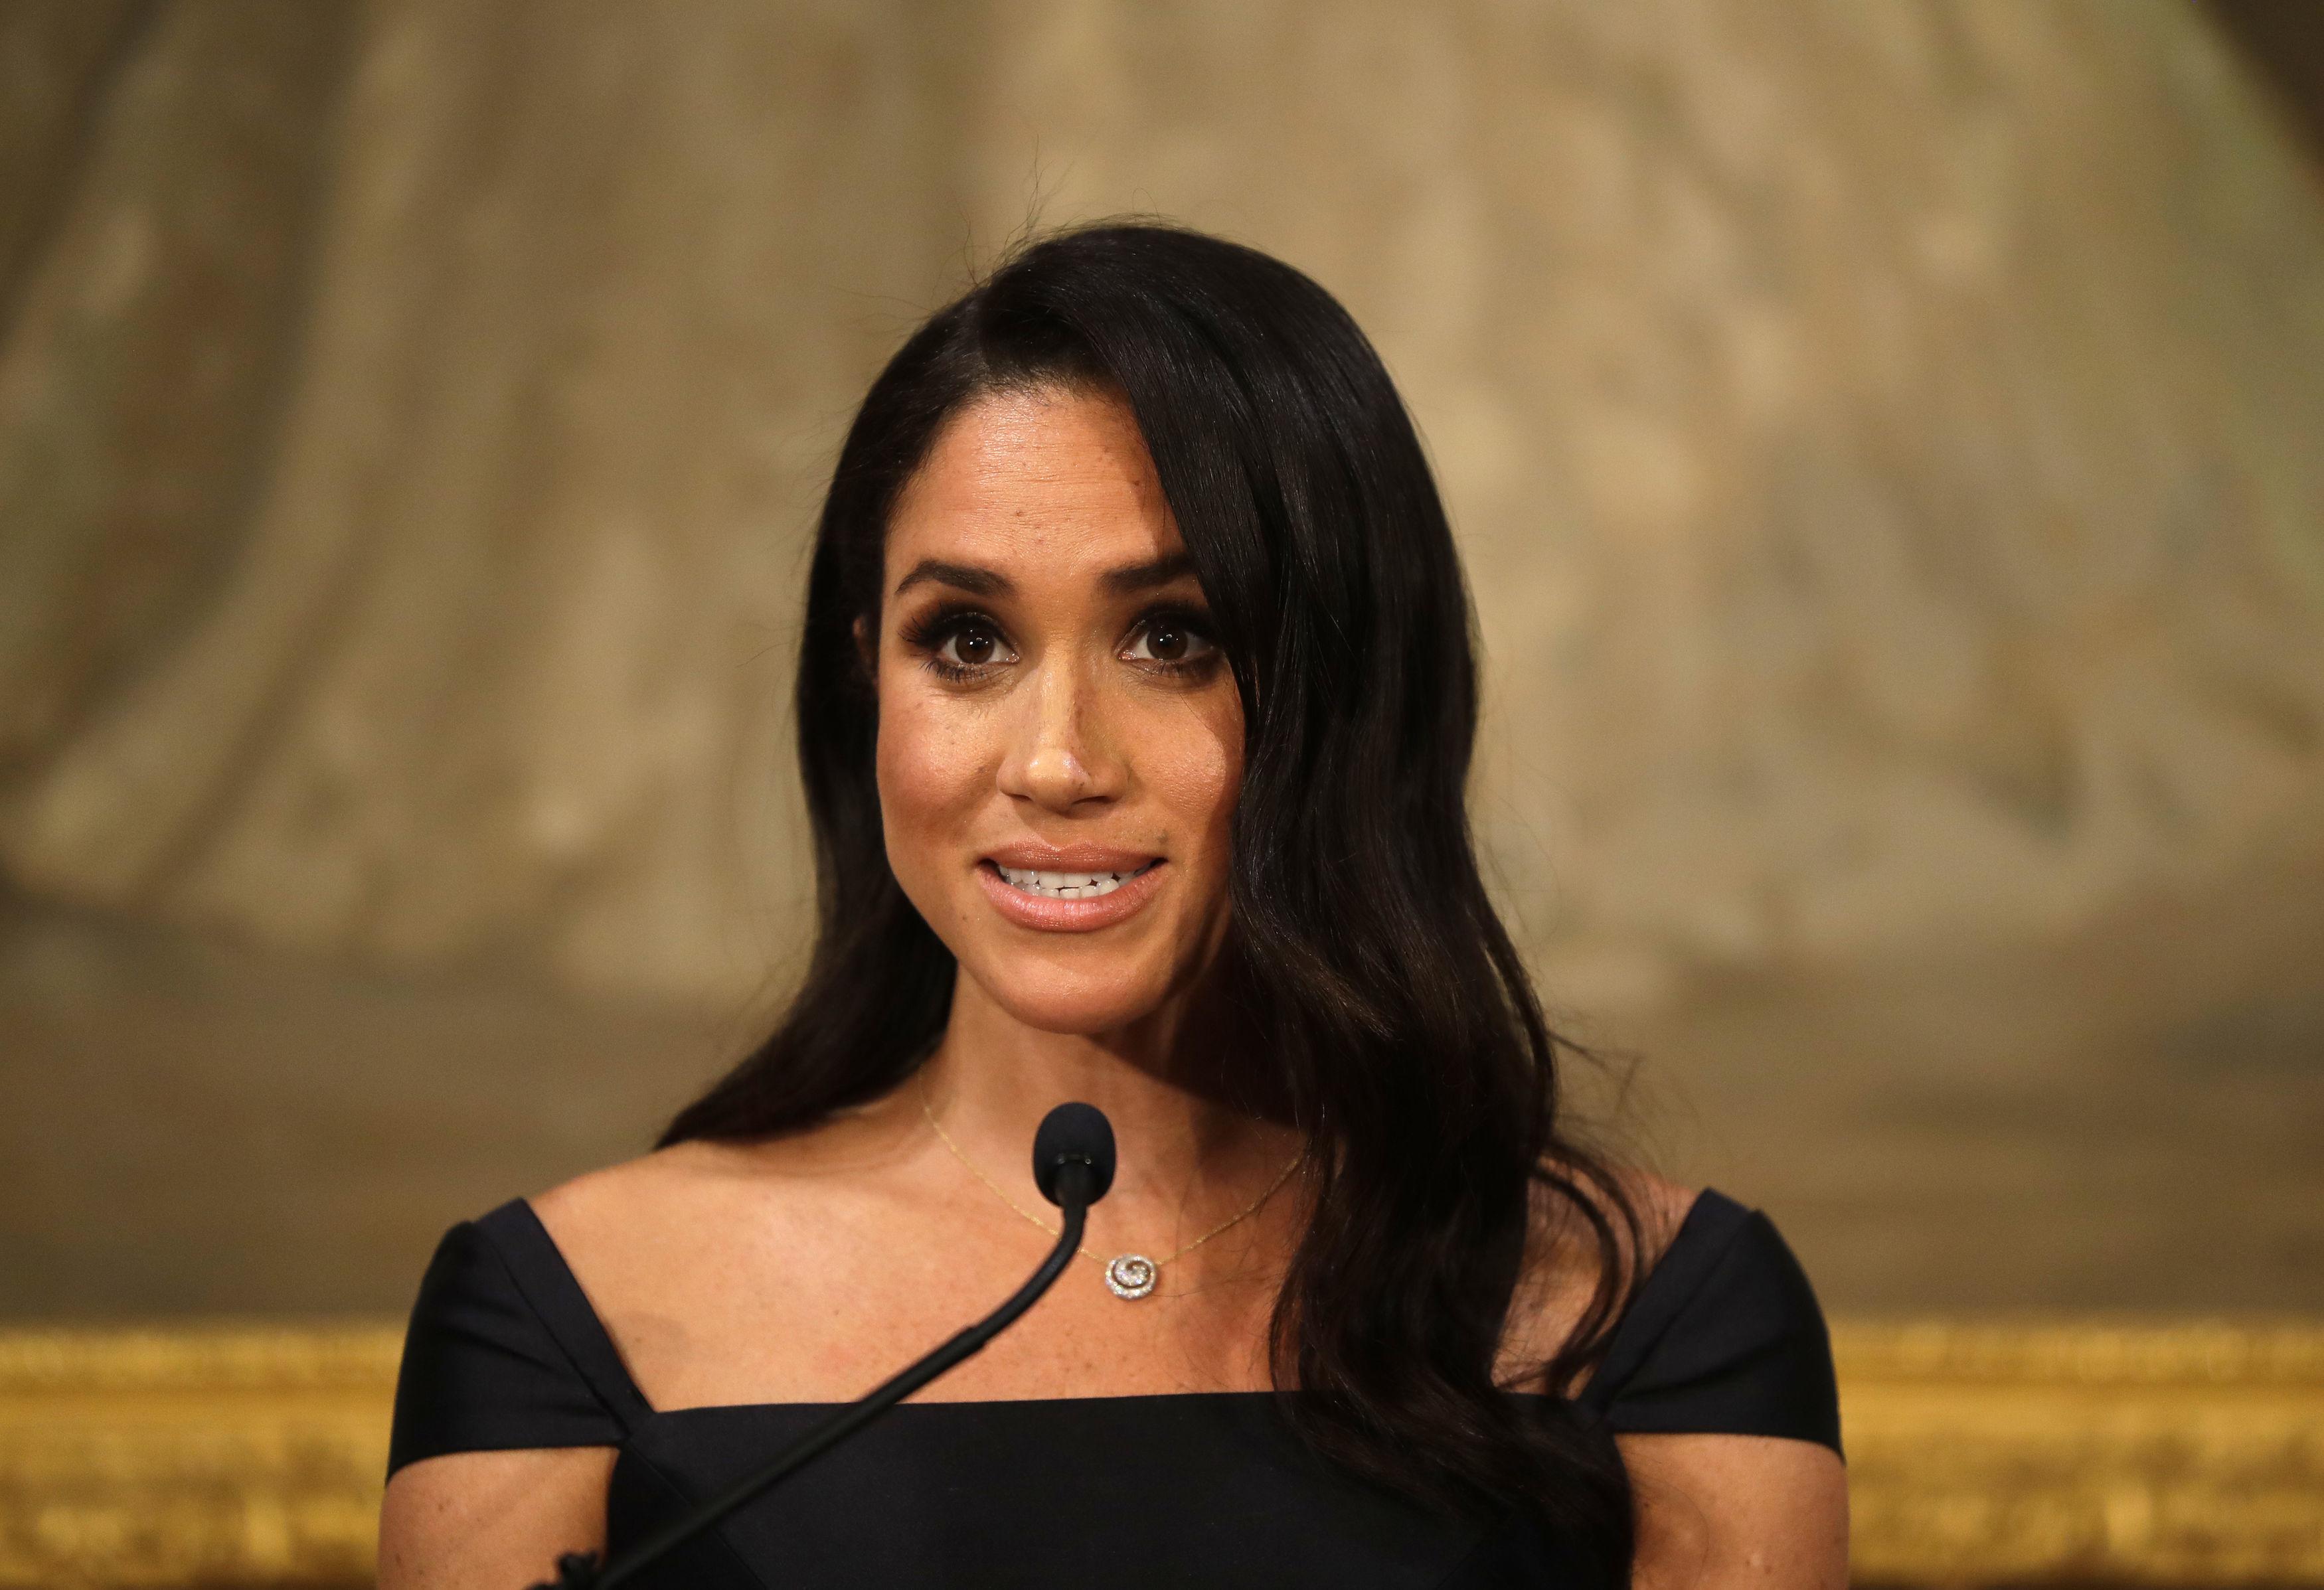 12 Times Celebrities Wore Gabriela Hearst's Designs